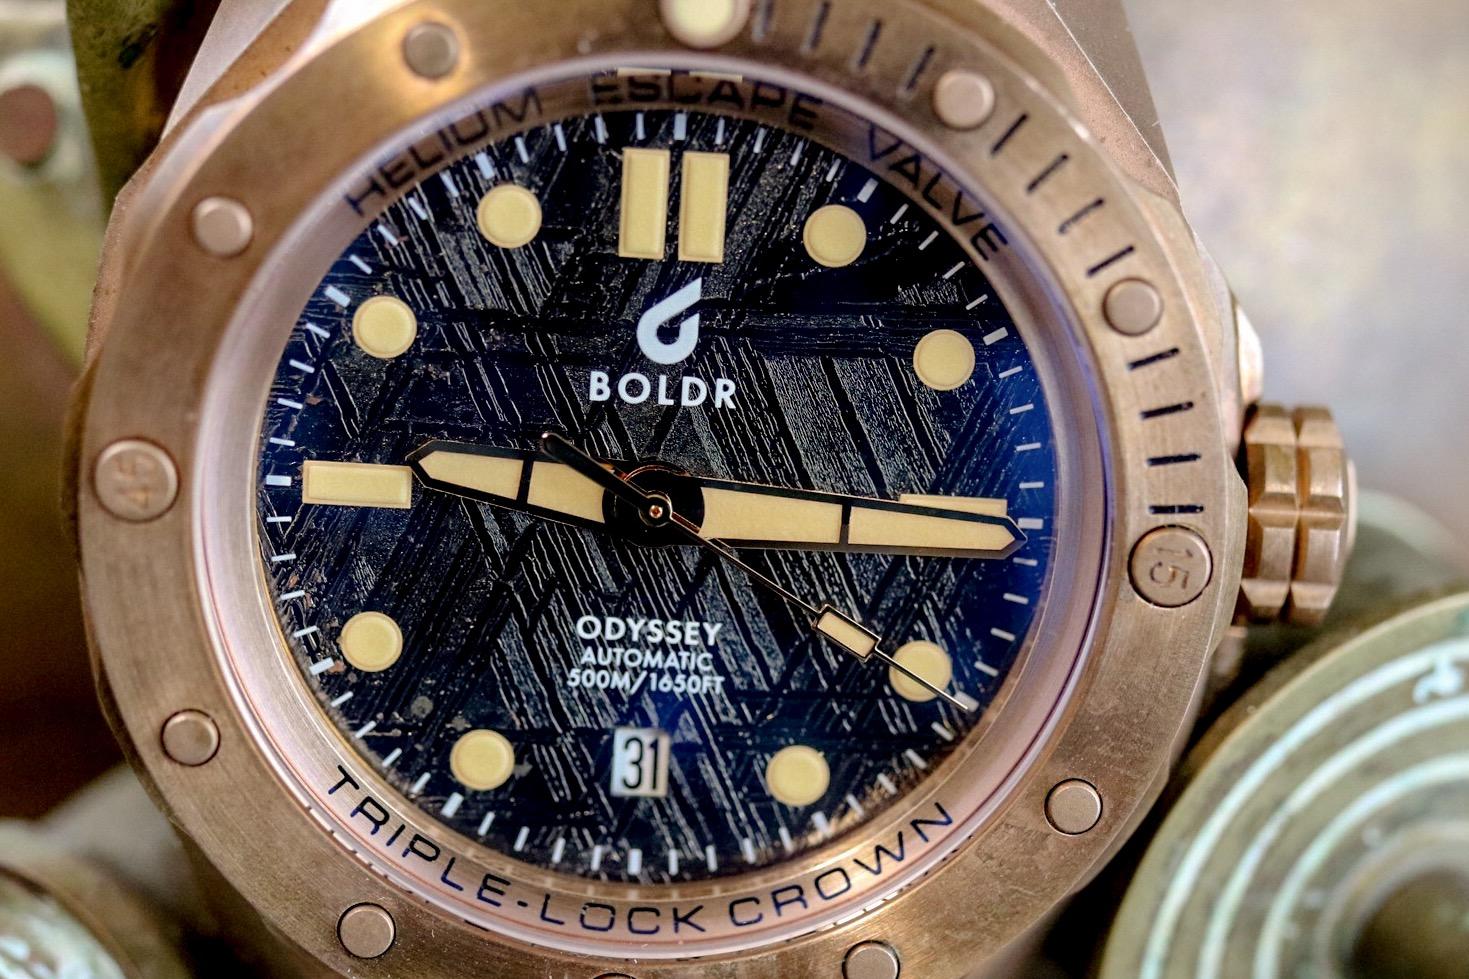 Boldr Odyssey Bronze